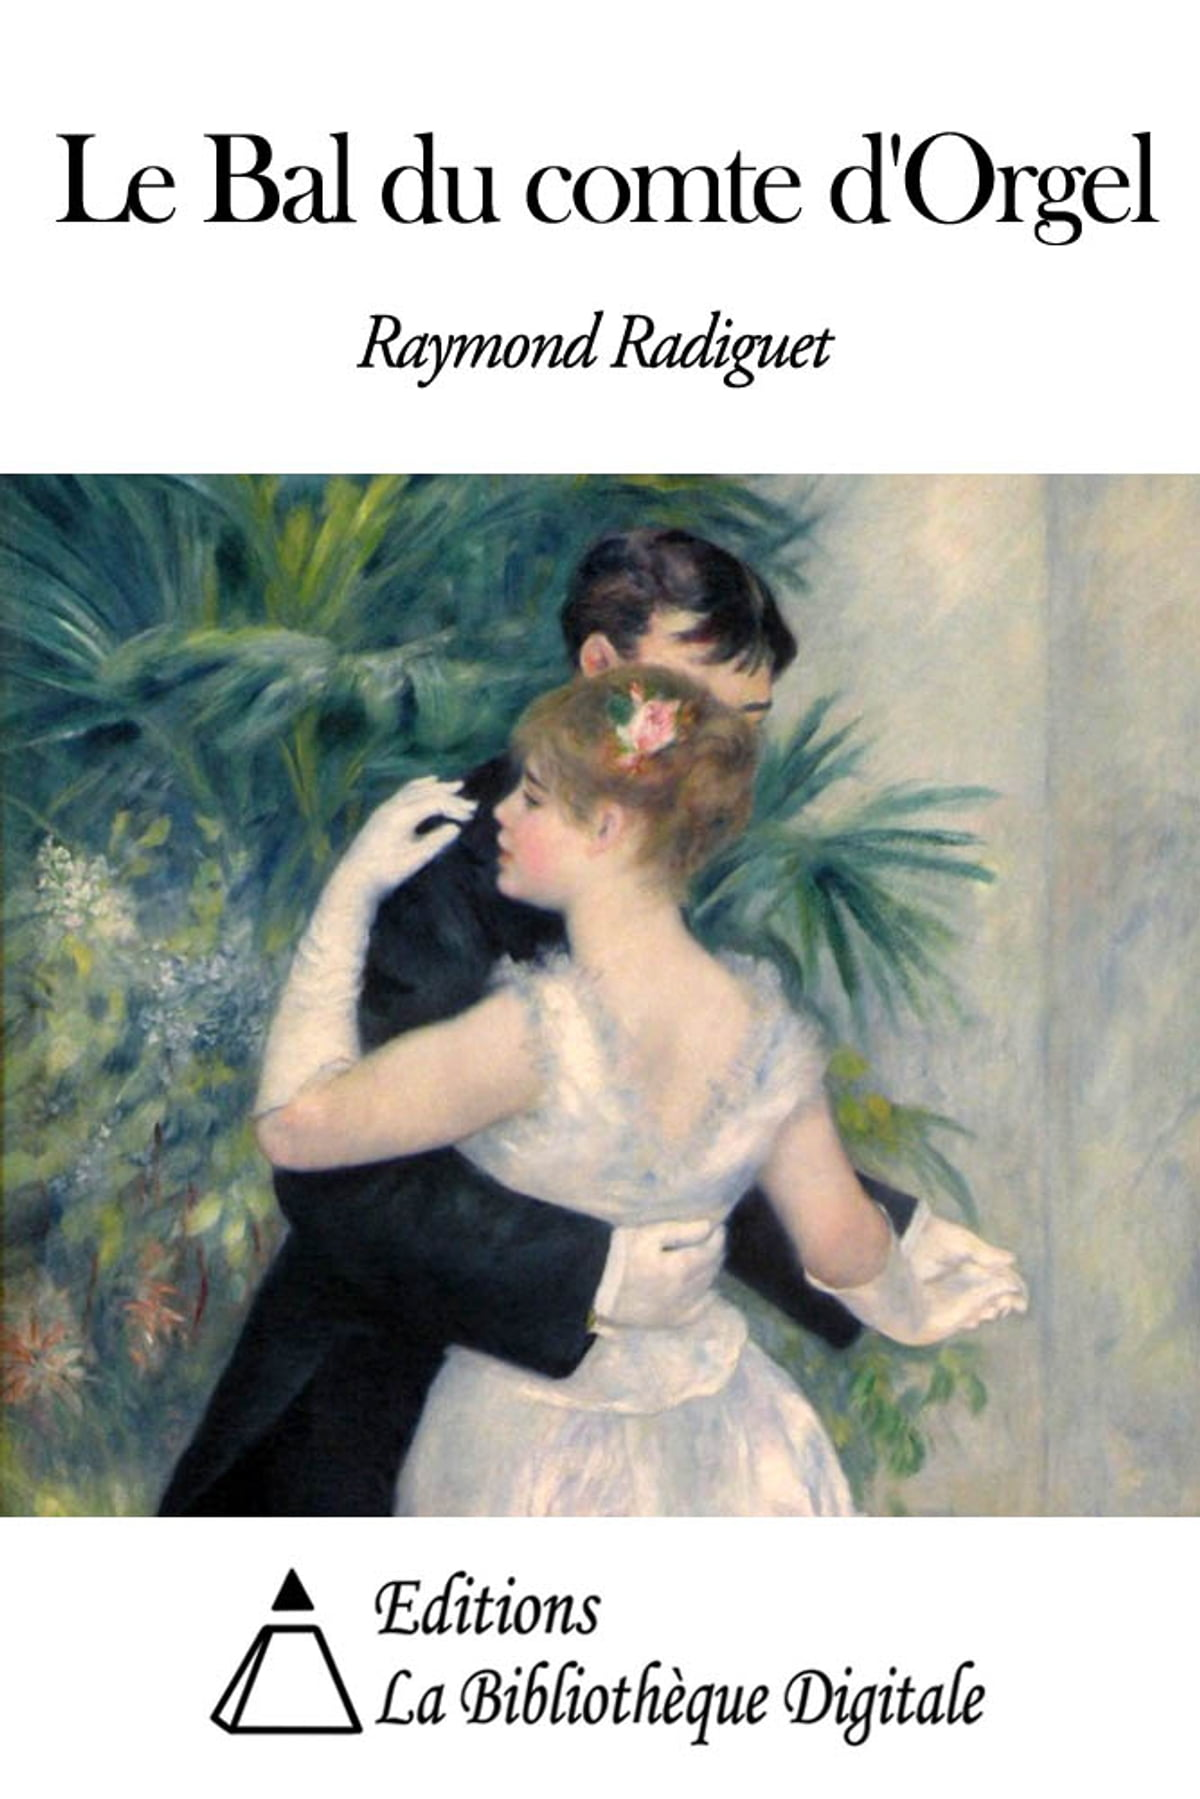 Le Bal Du Comte D'orgel : comte, d'orgel, Comte, D'Orgel, EBook, Raymond, Radiguet, 1230000108615, Rakuten, United, States